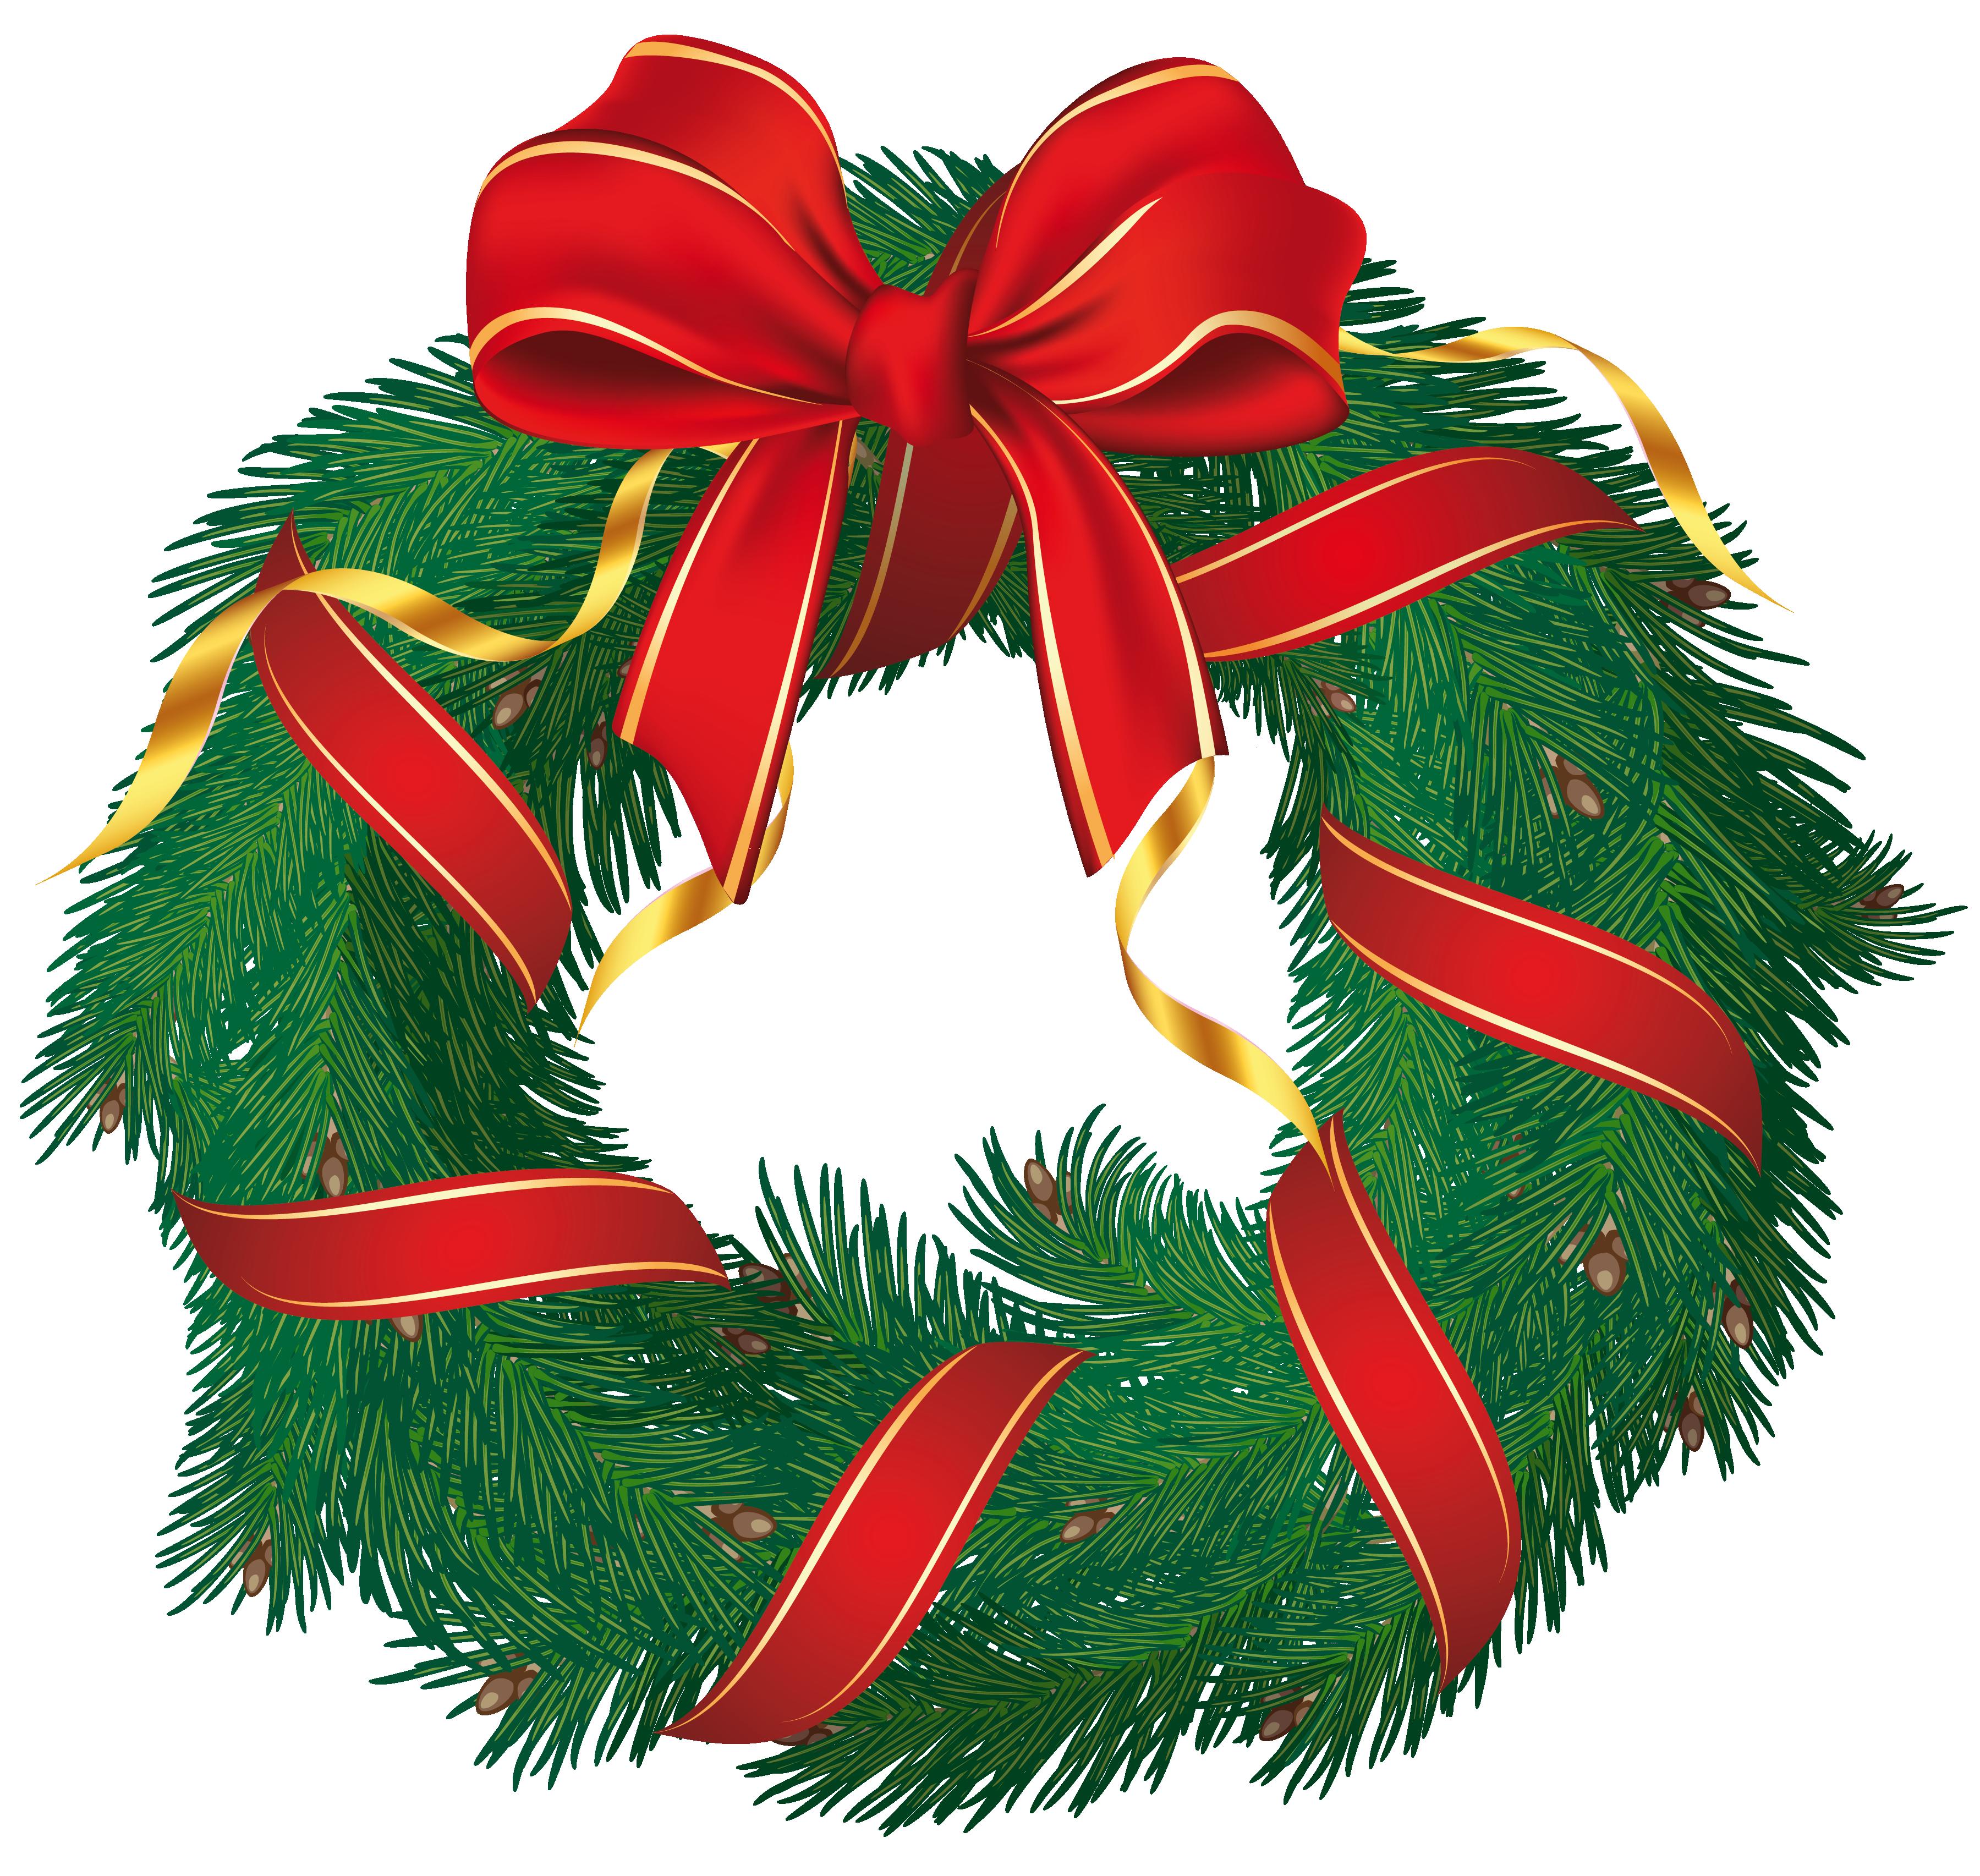 Clipart xmas wreath banner transparent Free Christmas Wreath Cliparts, Download Free Clip Art, Free Clip ... banner transparent